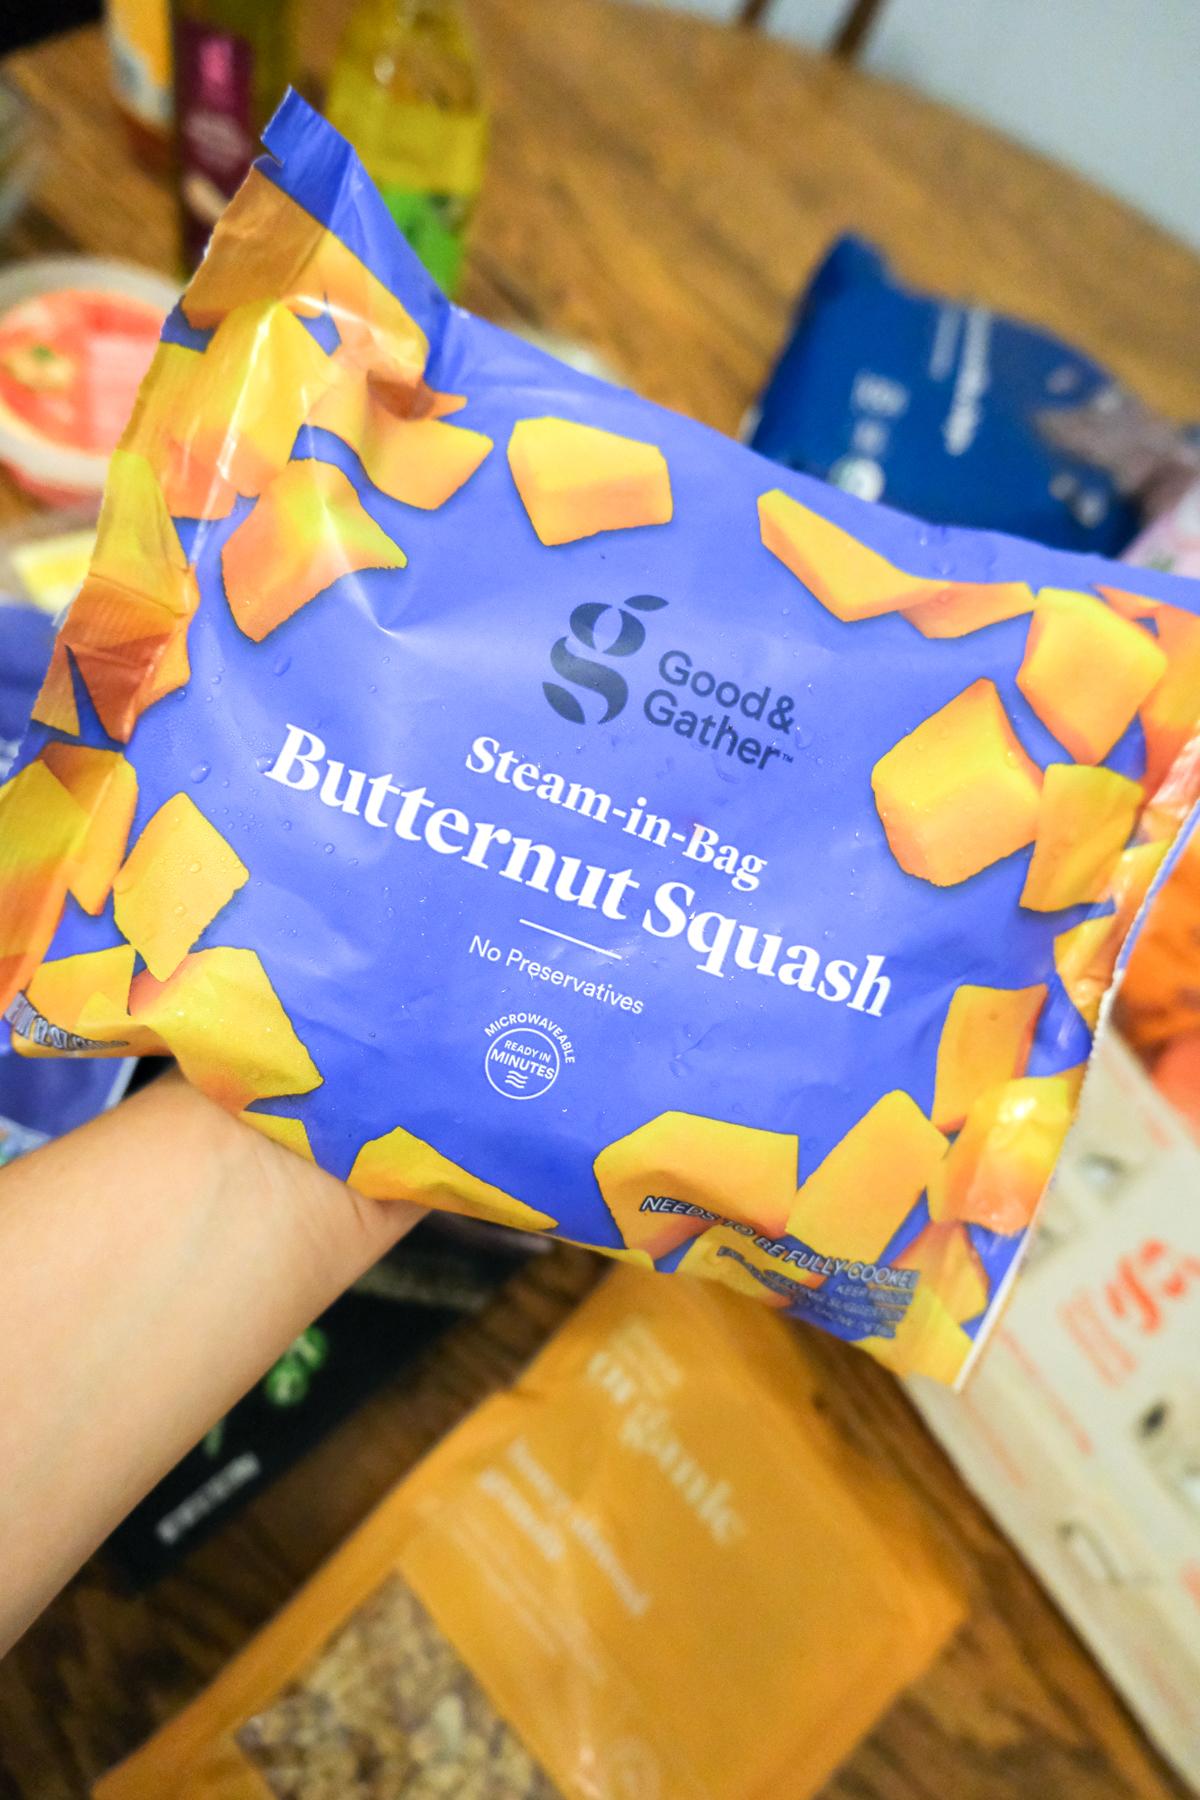 frozen butternut squash Good & Gather from Target